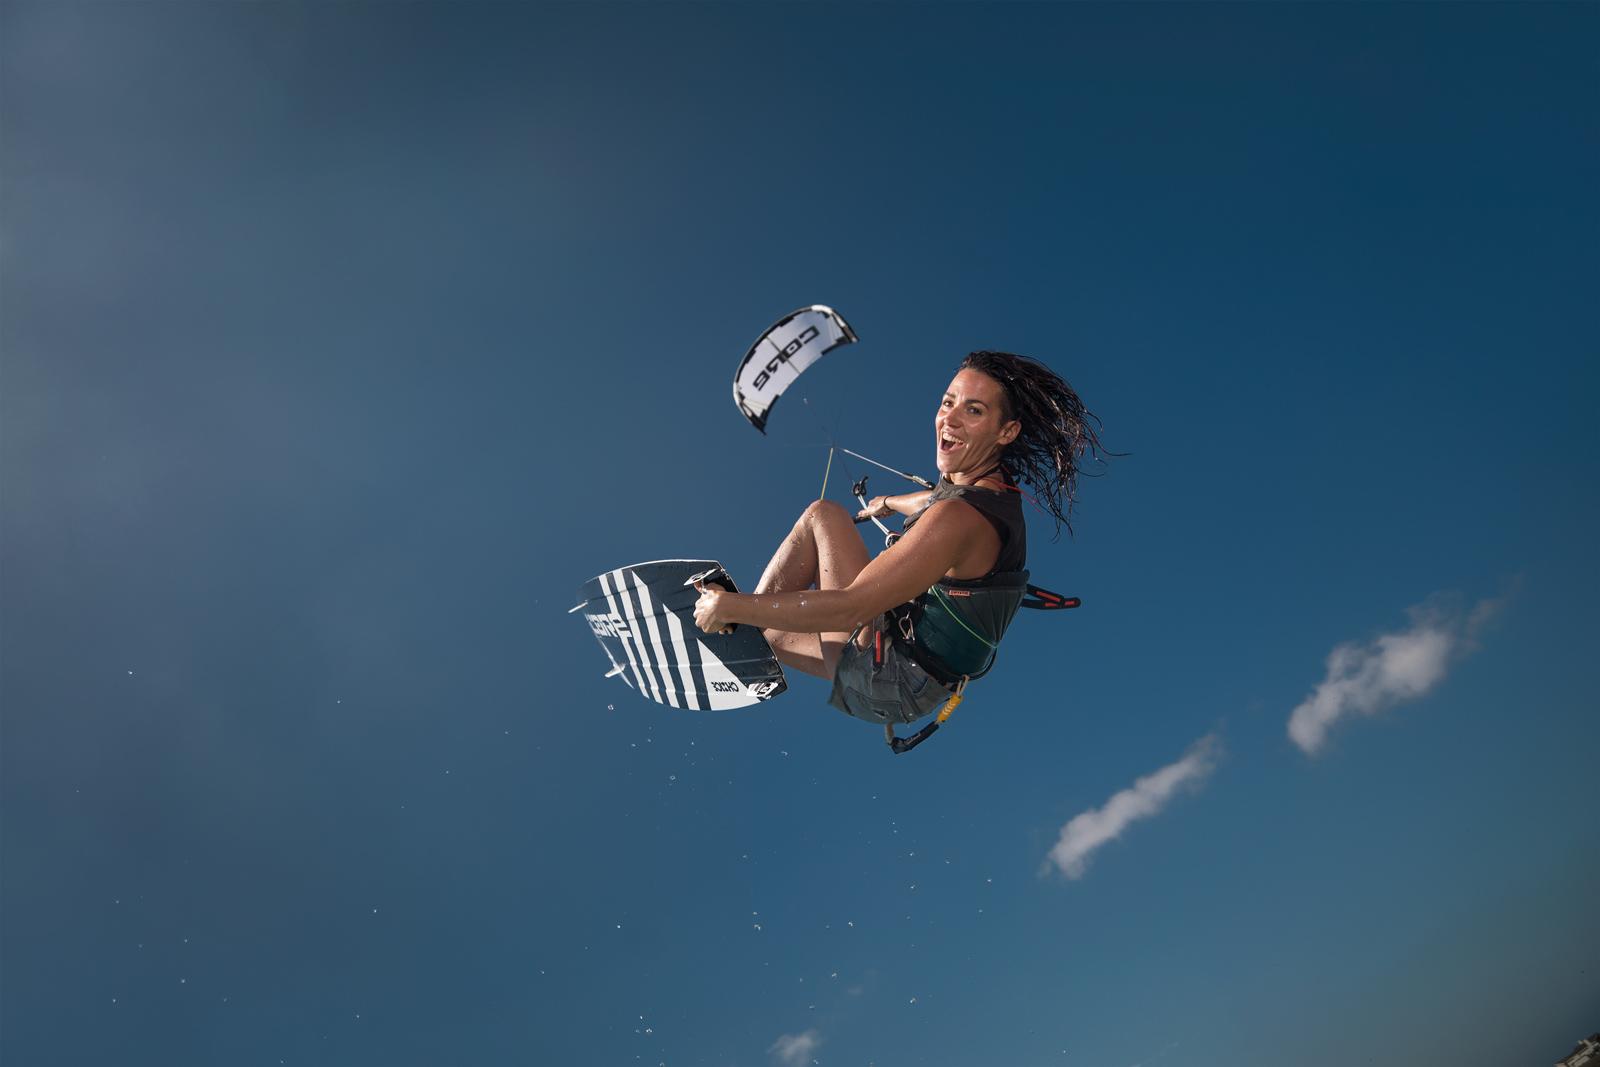 CORE_Kiteboarding_GTS6_LW_Lightwind_Freestyle_TB30731_1600_Thomas_Burblies